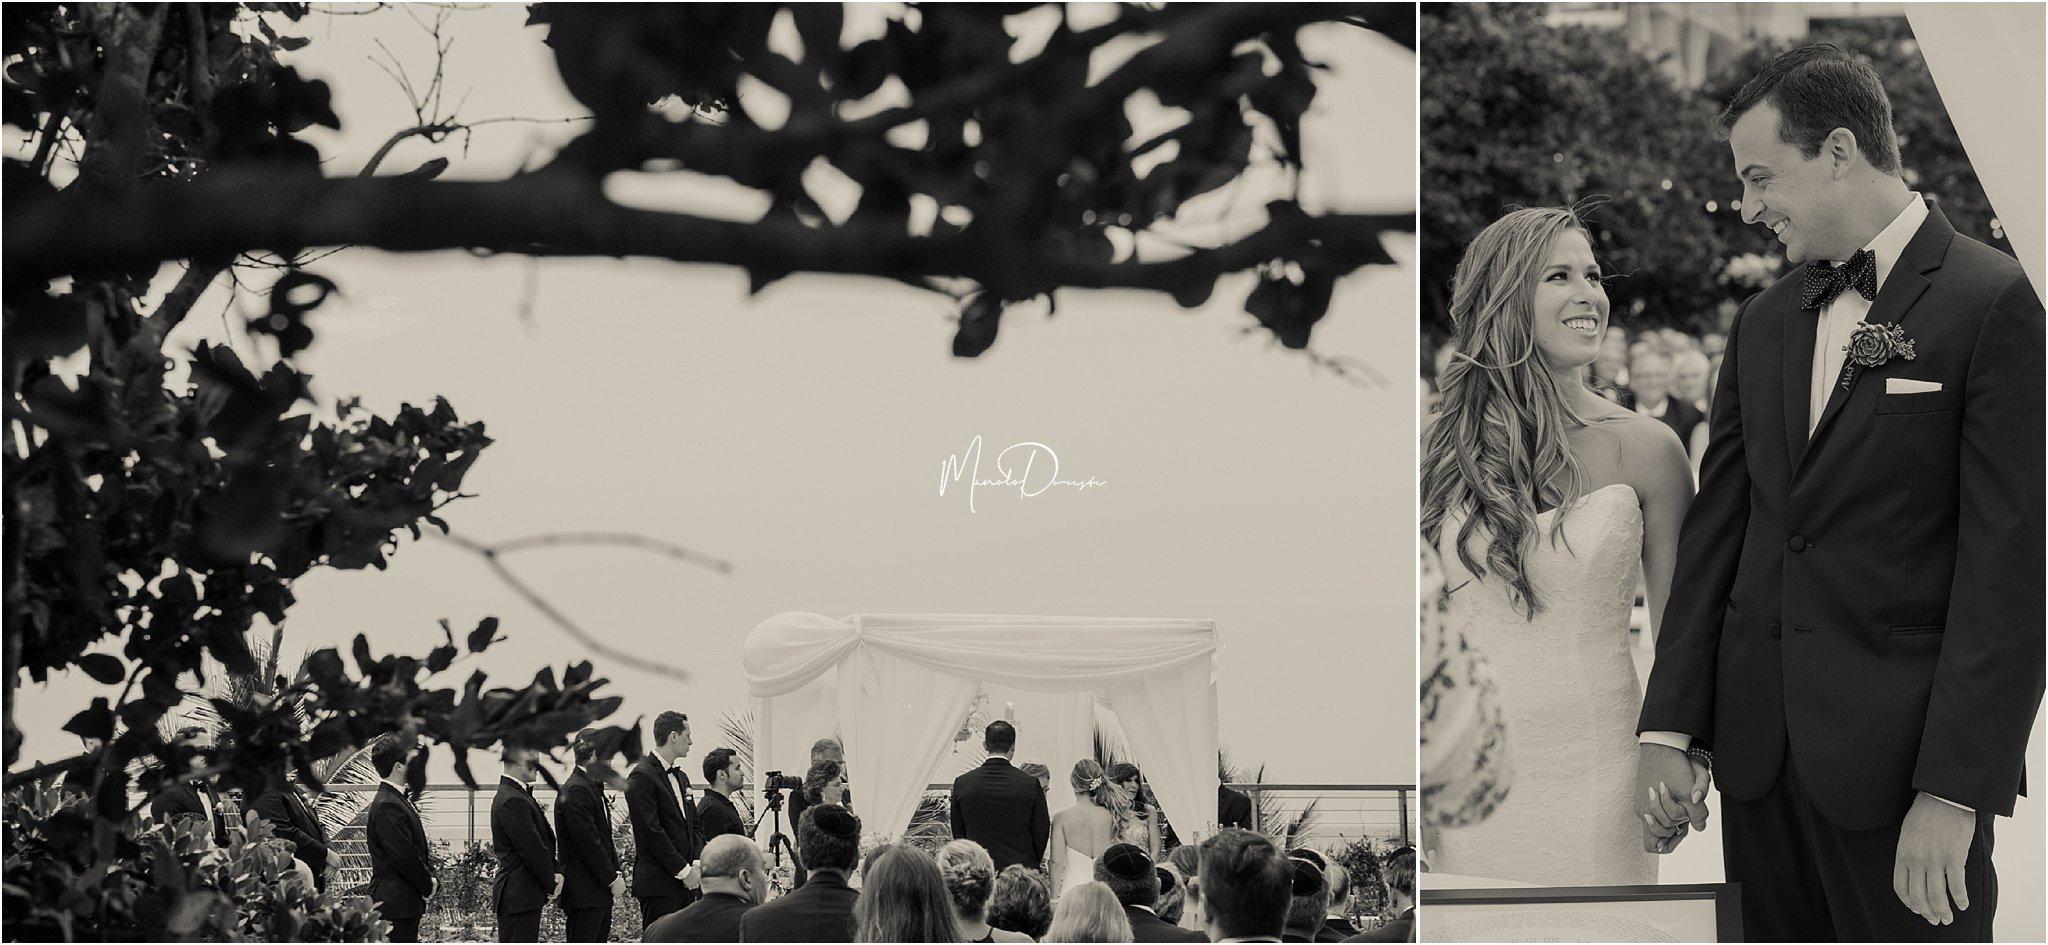 0668_ManoloDoreste_InFocusStudios_Wedding_Family_Photography_Miami_MiamiPhotographer.jpg